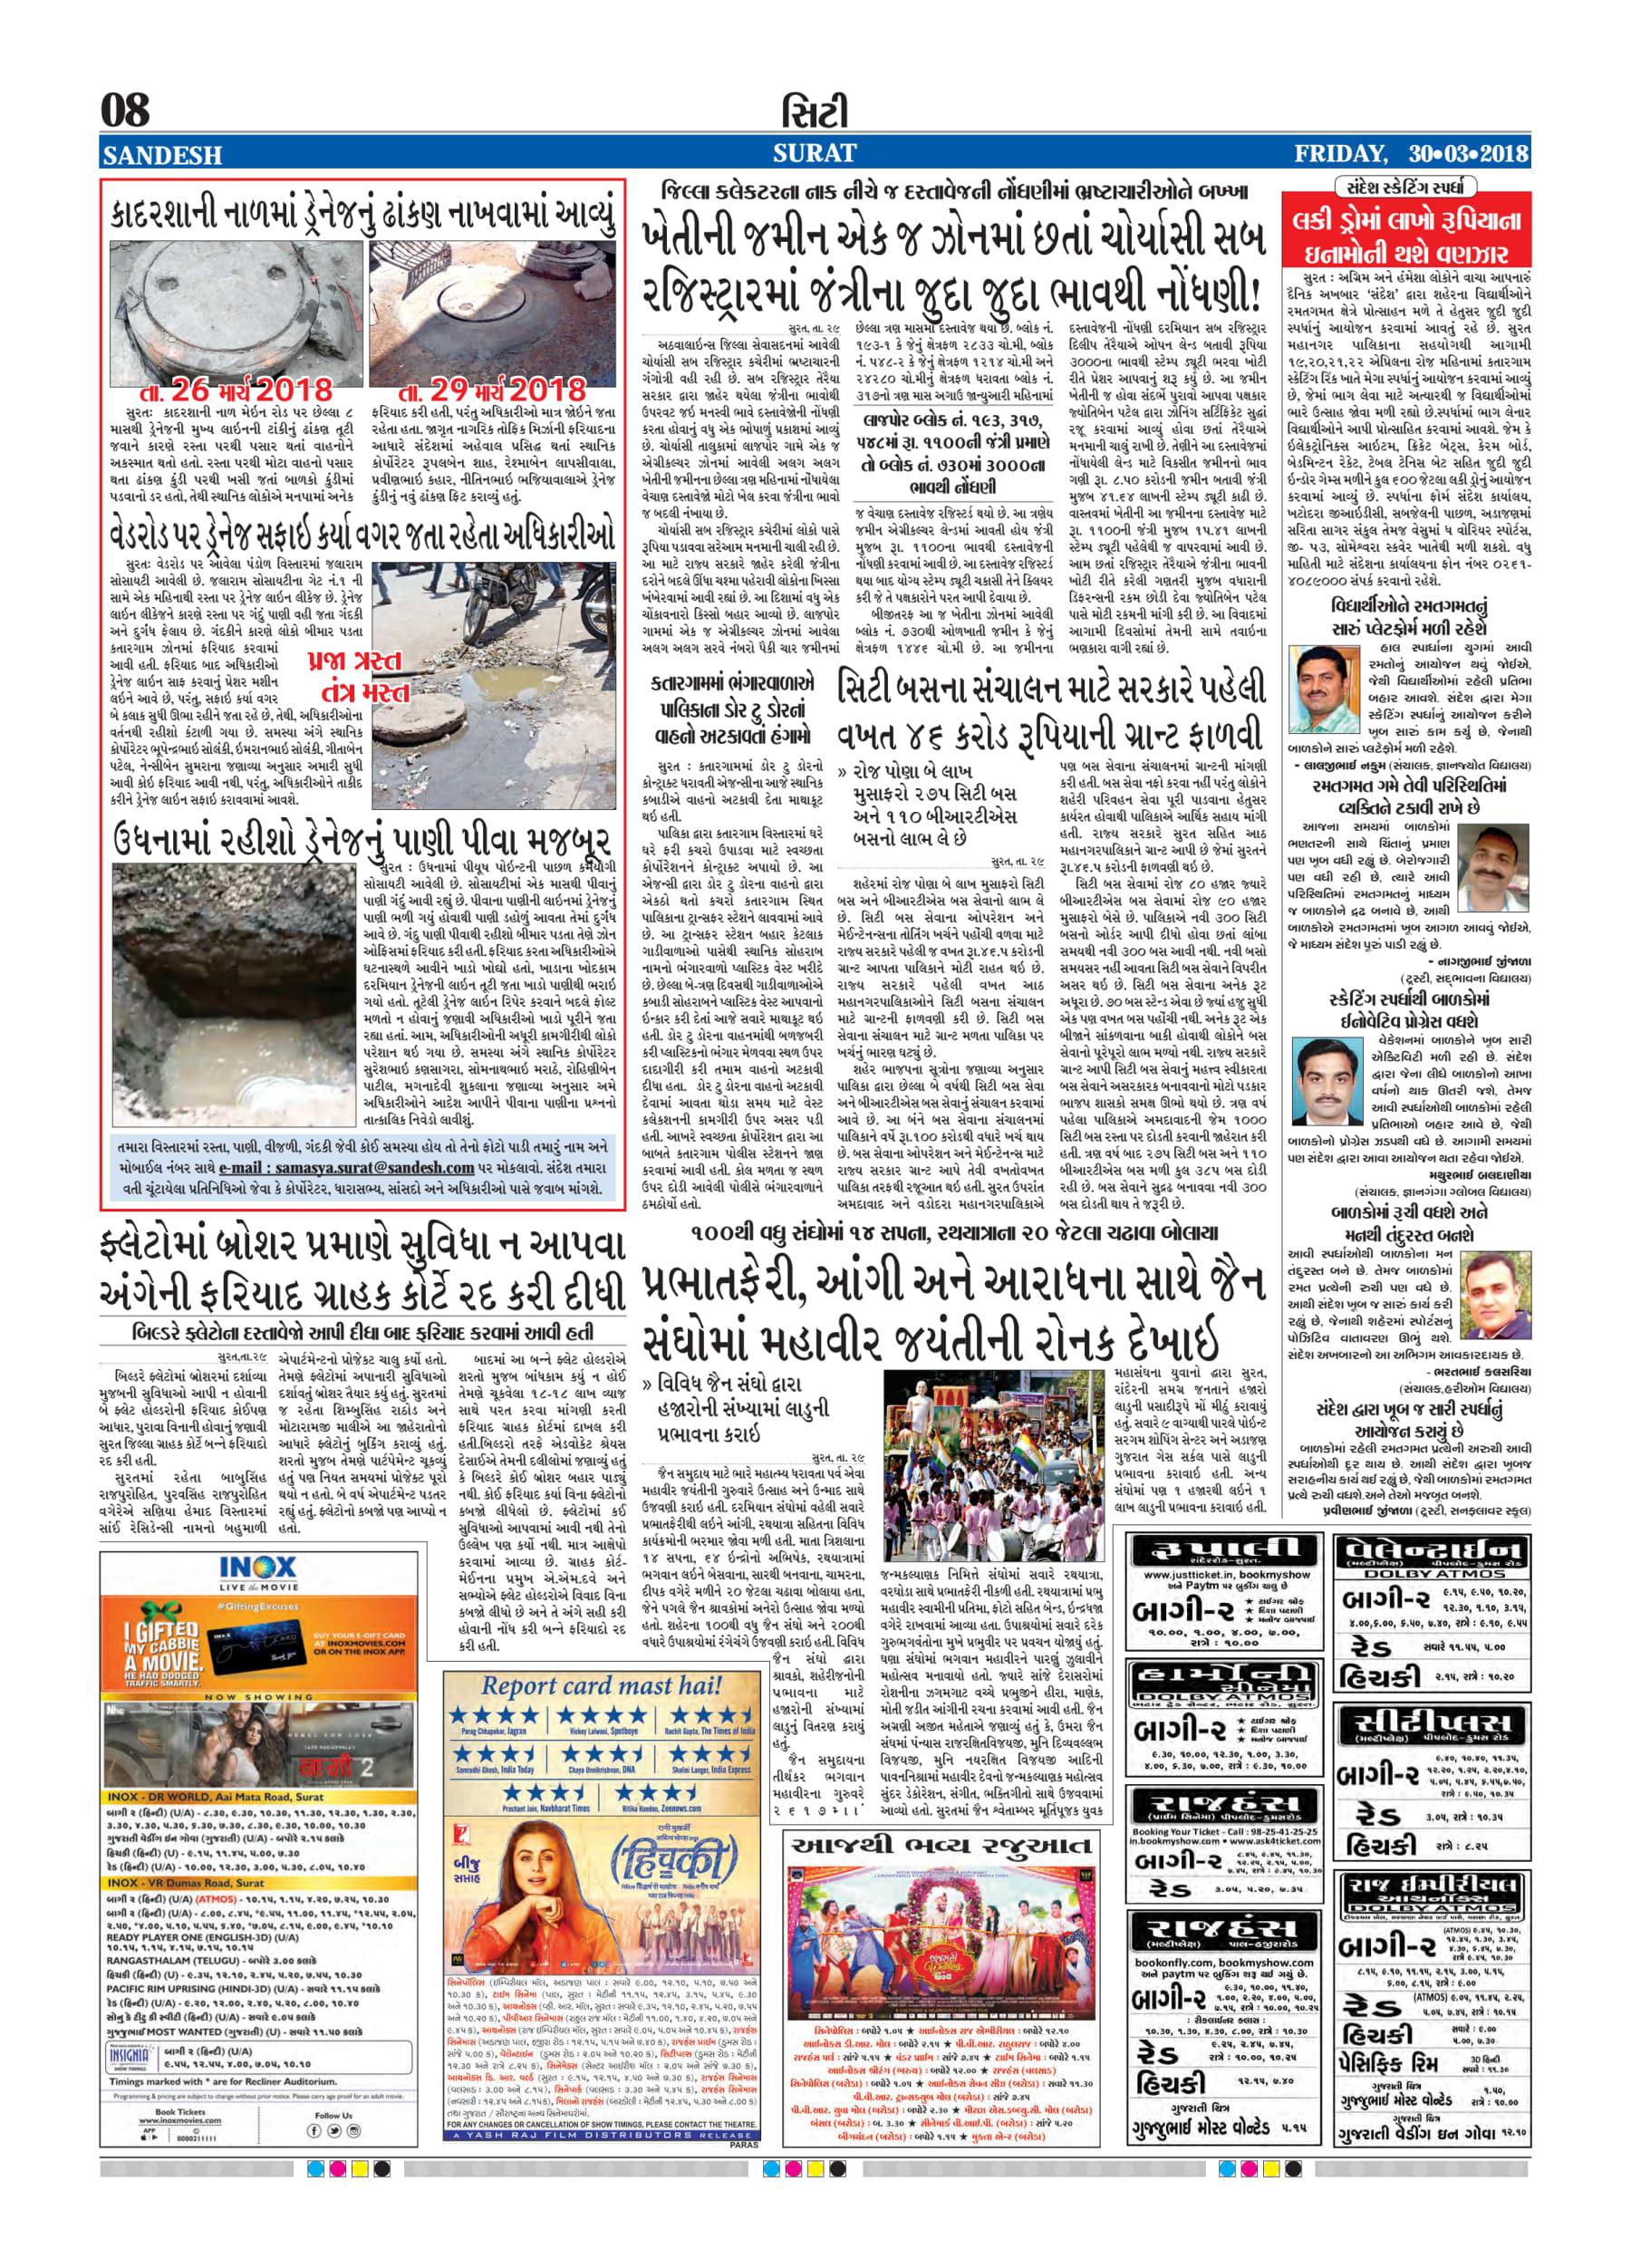 Sandesh Newspaper Today Pdf